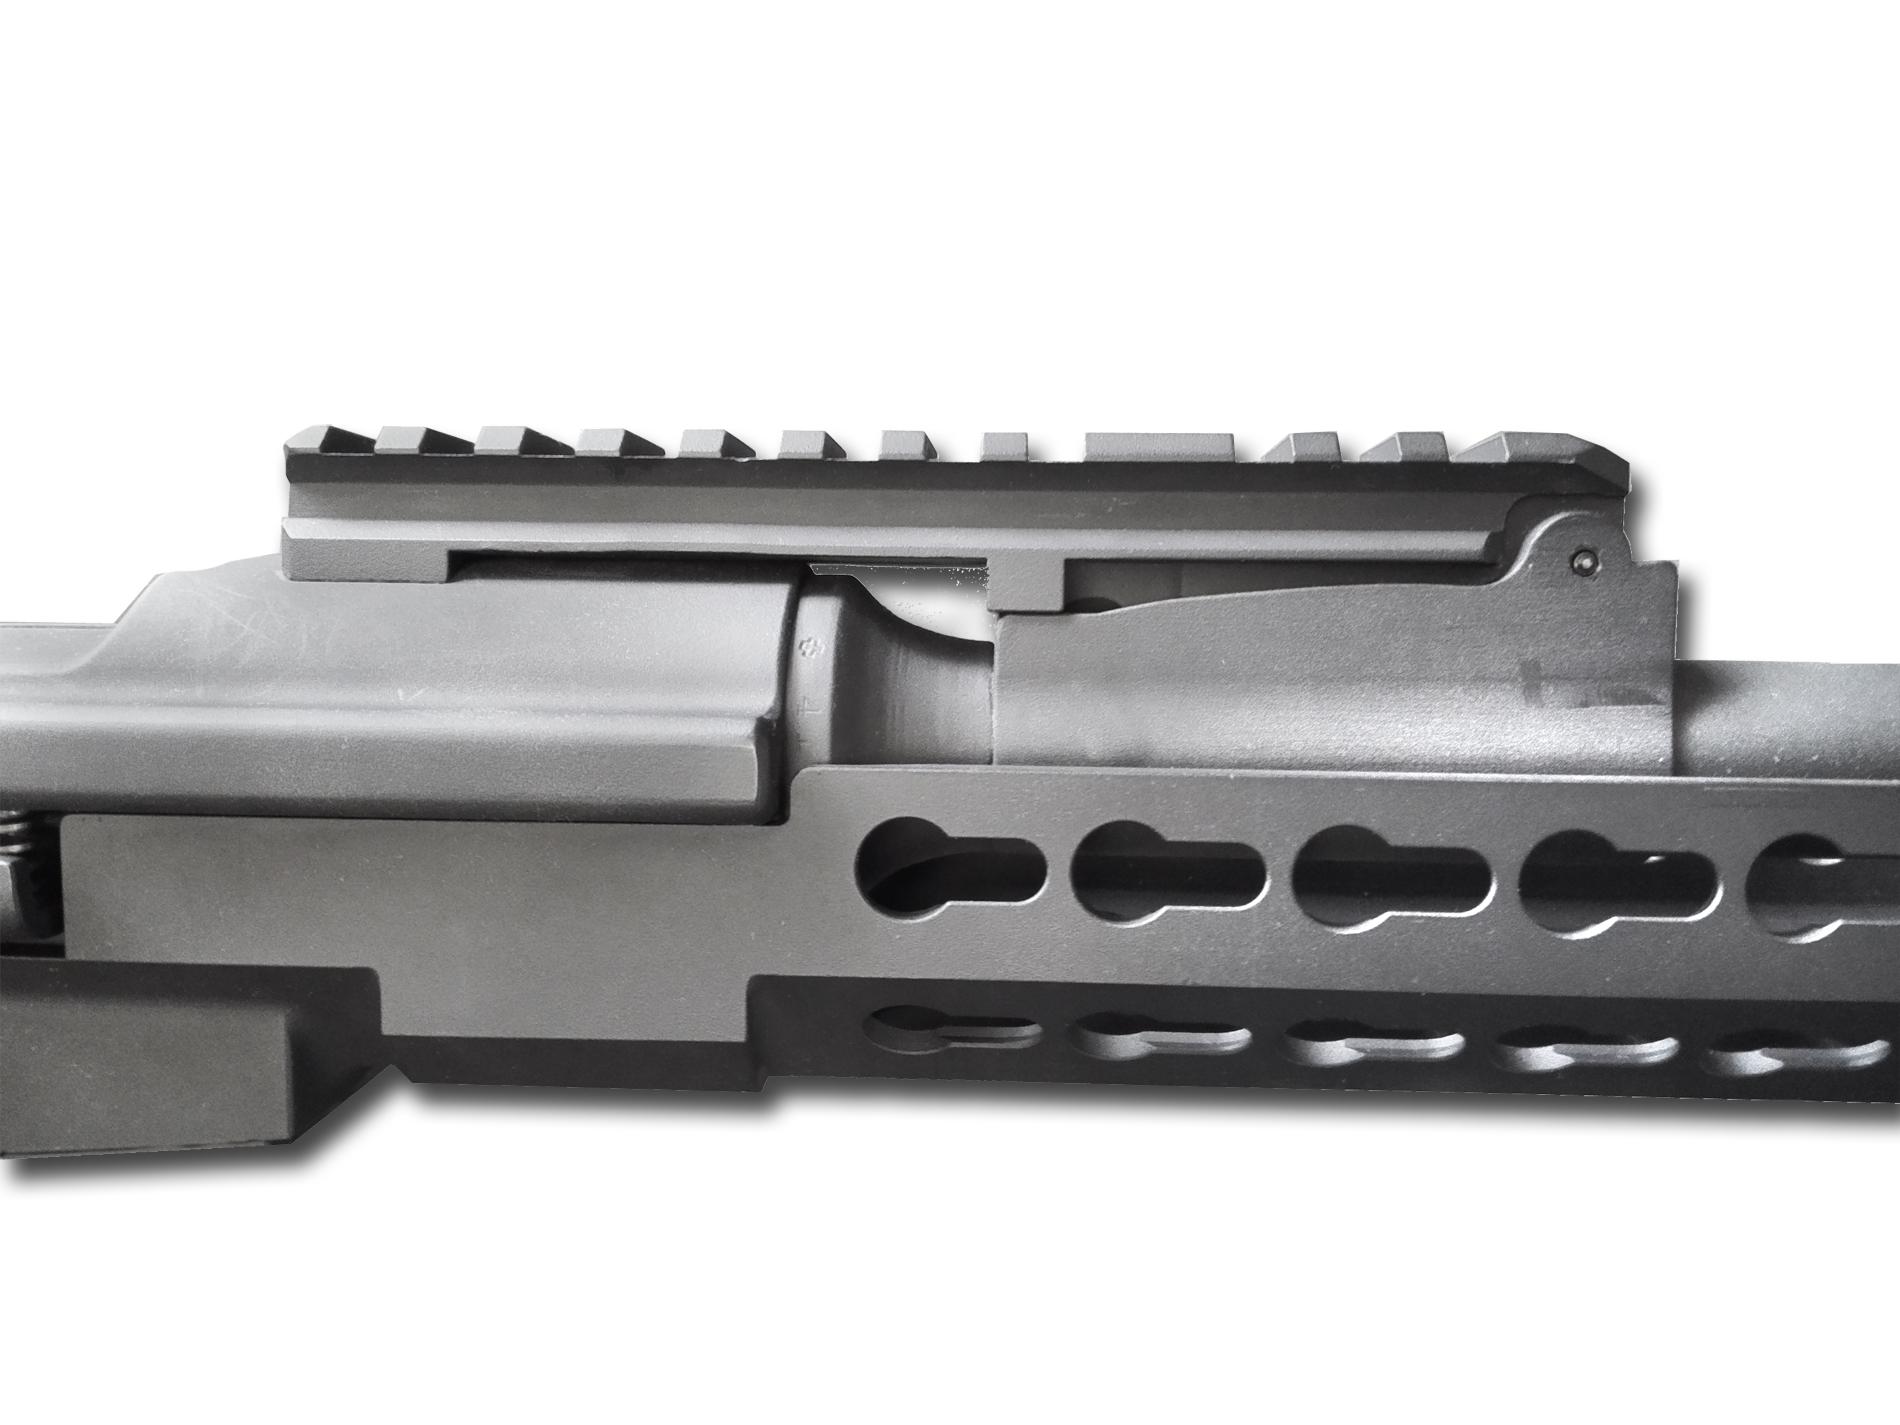 K31 rifle SAG optics mount